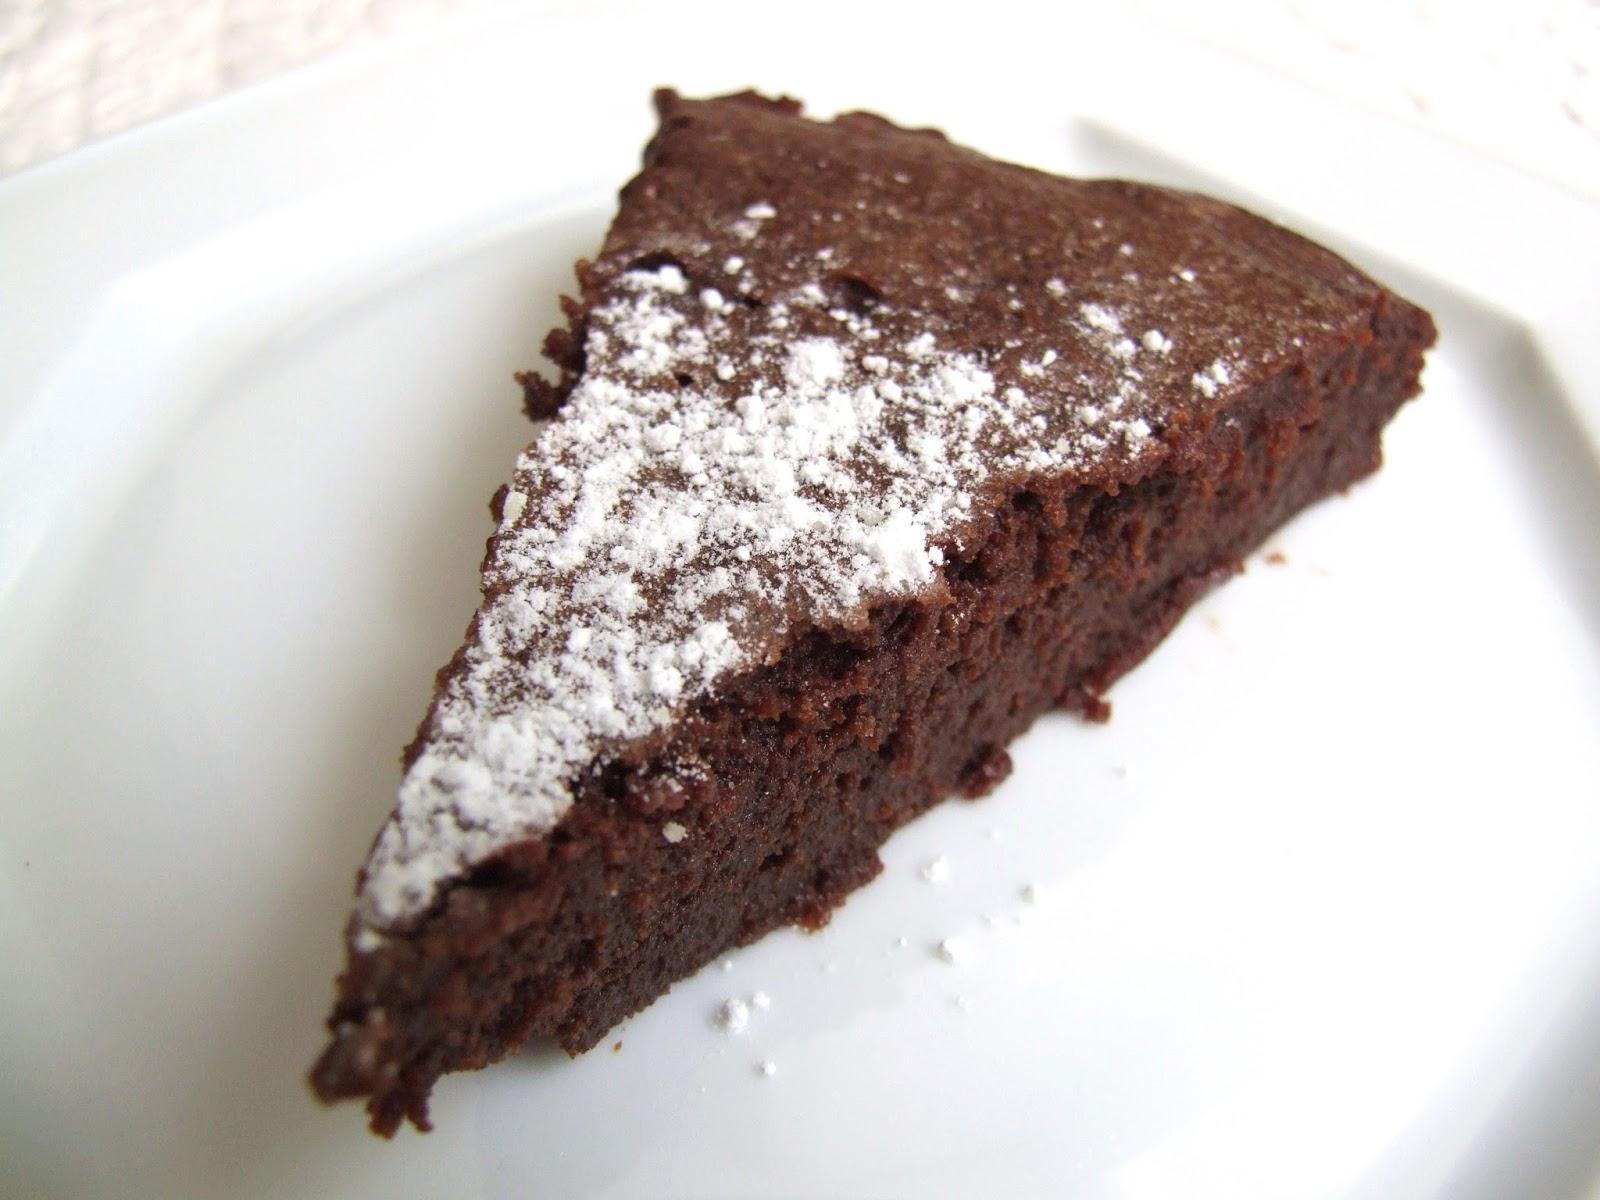 Gateau express chocolat thermomix les recettes - Gateau nature thermomix ...